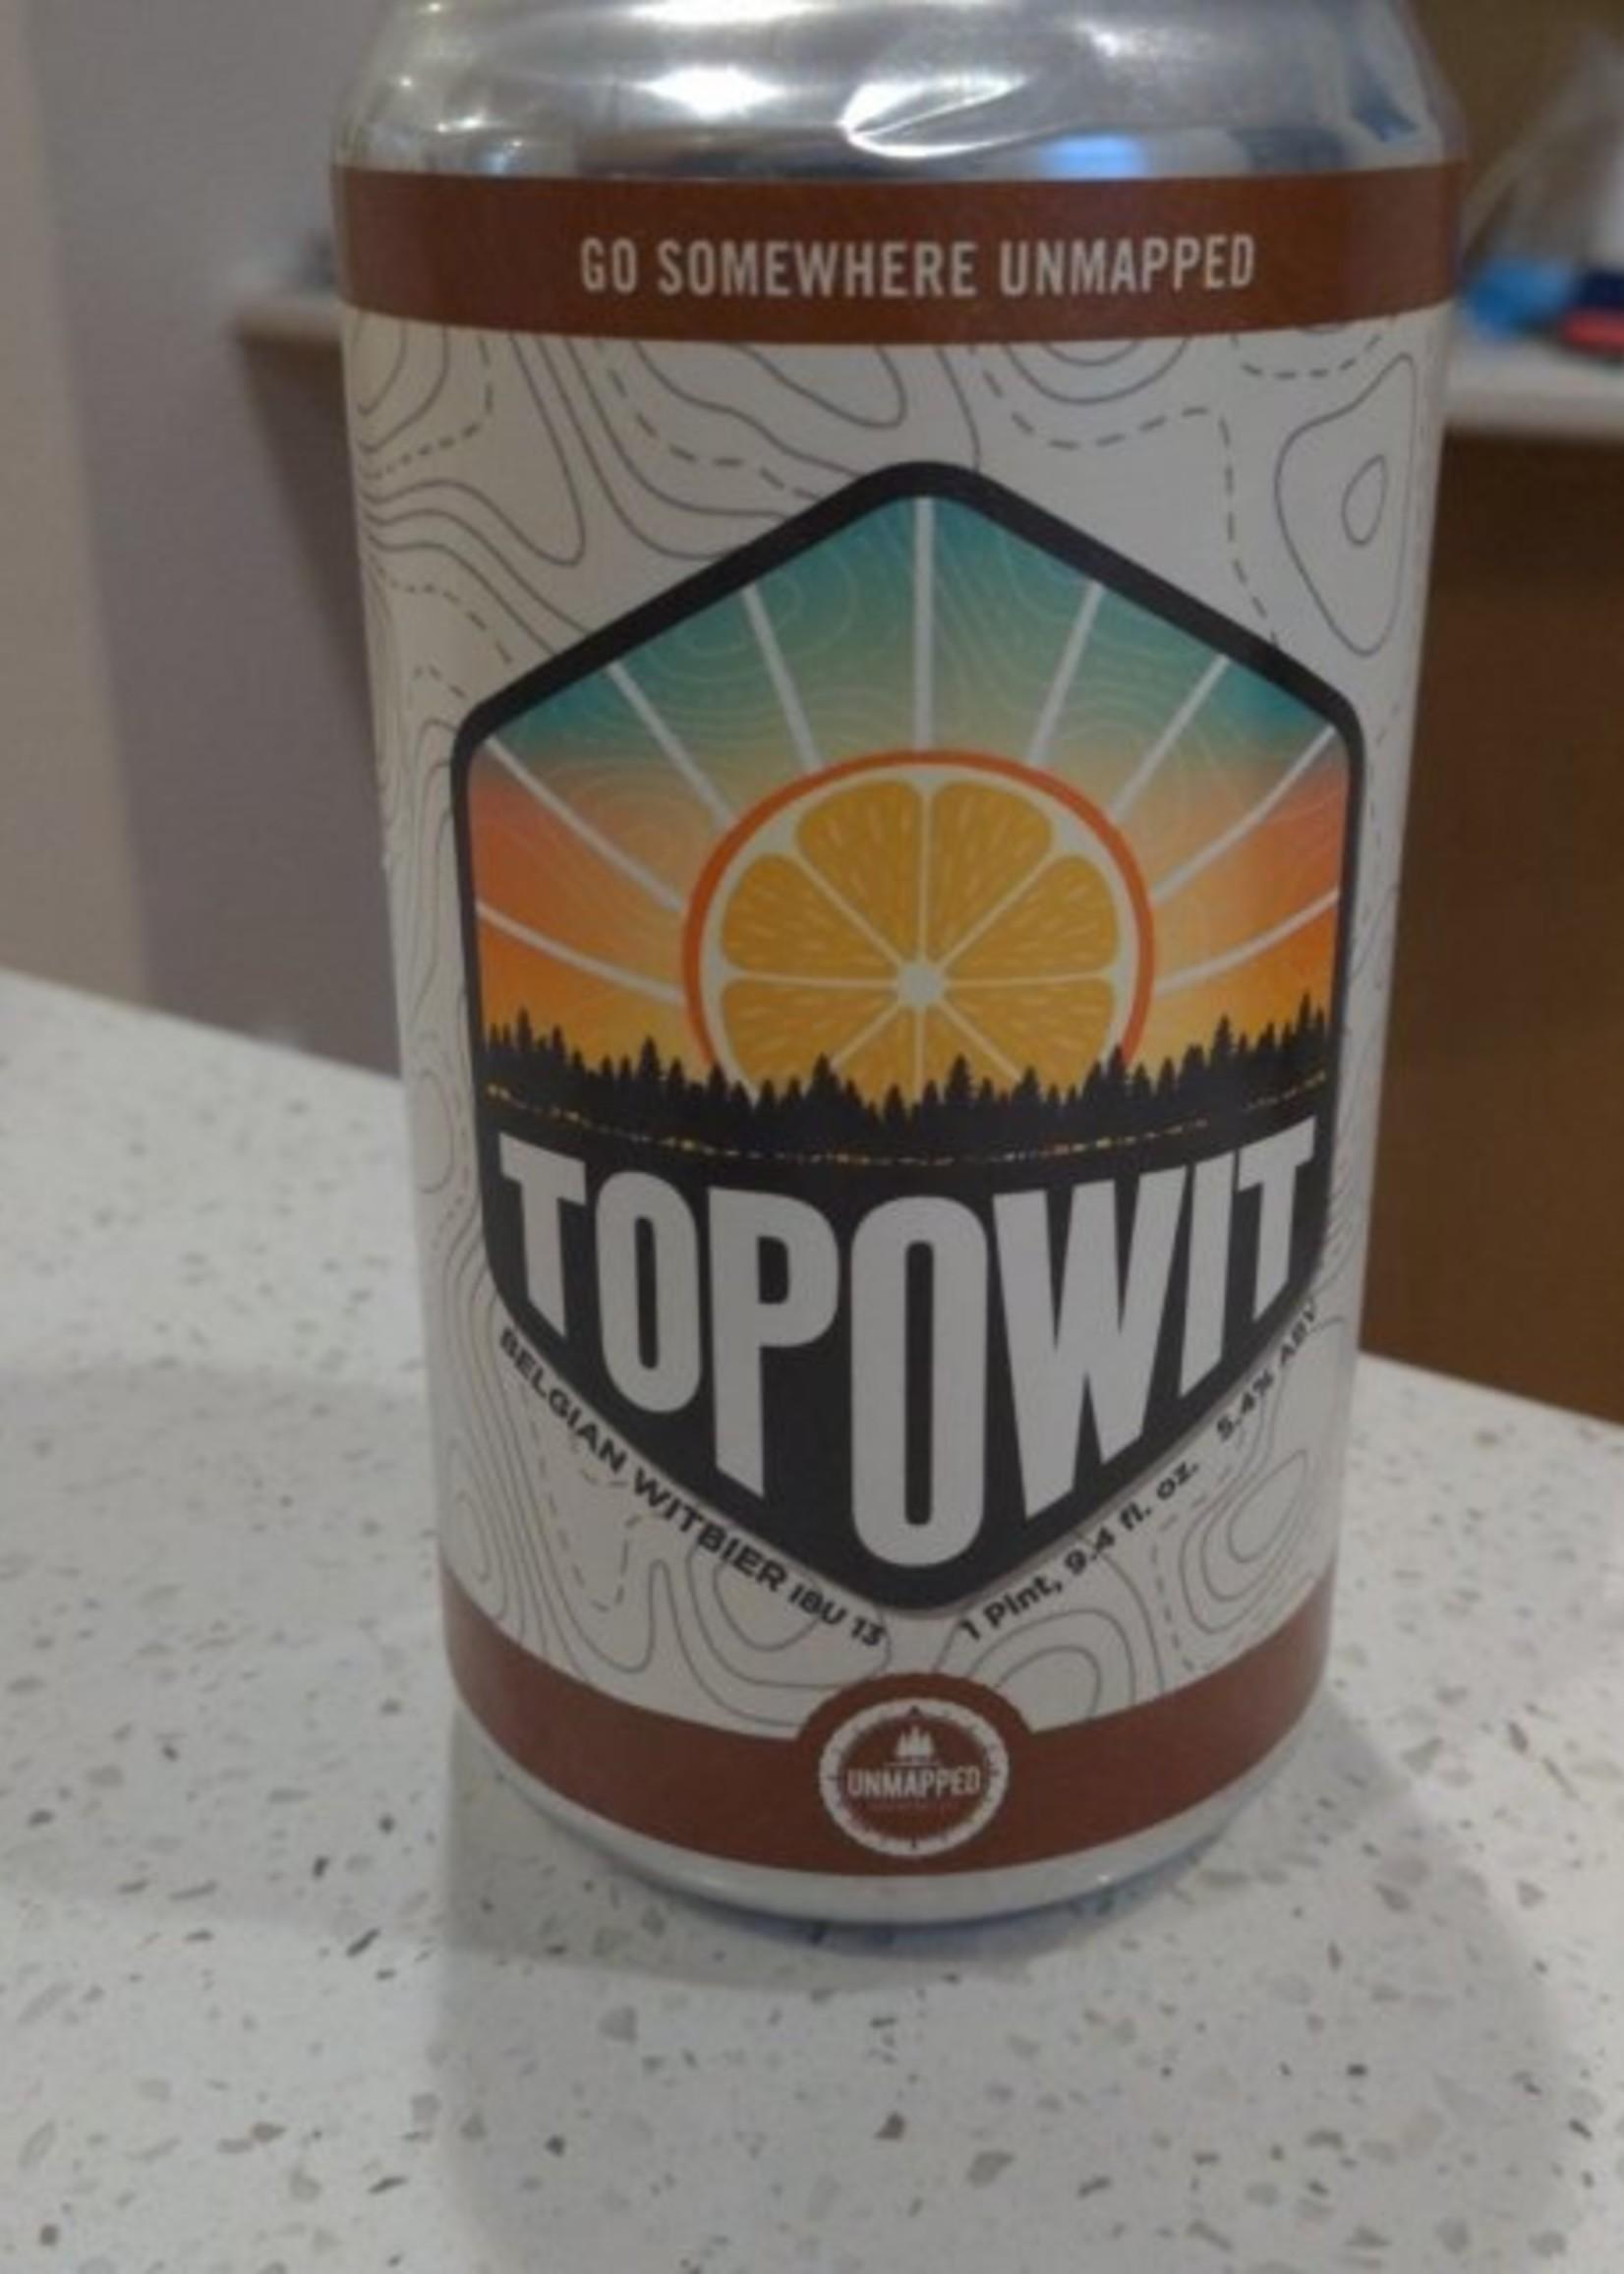 Unmapped Topo Wit 6x12oz Cans